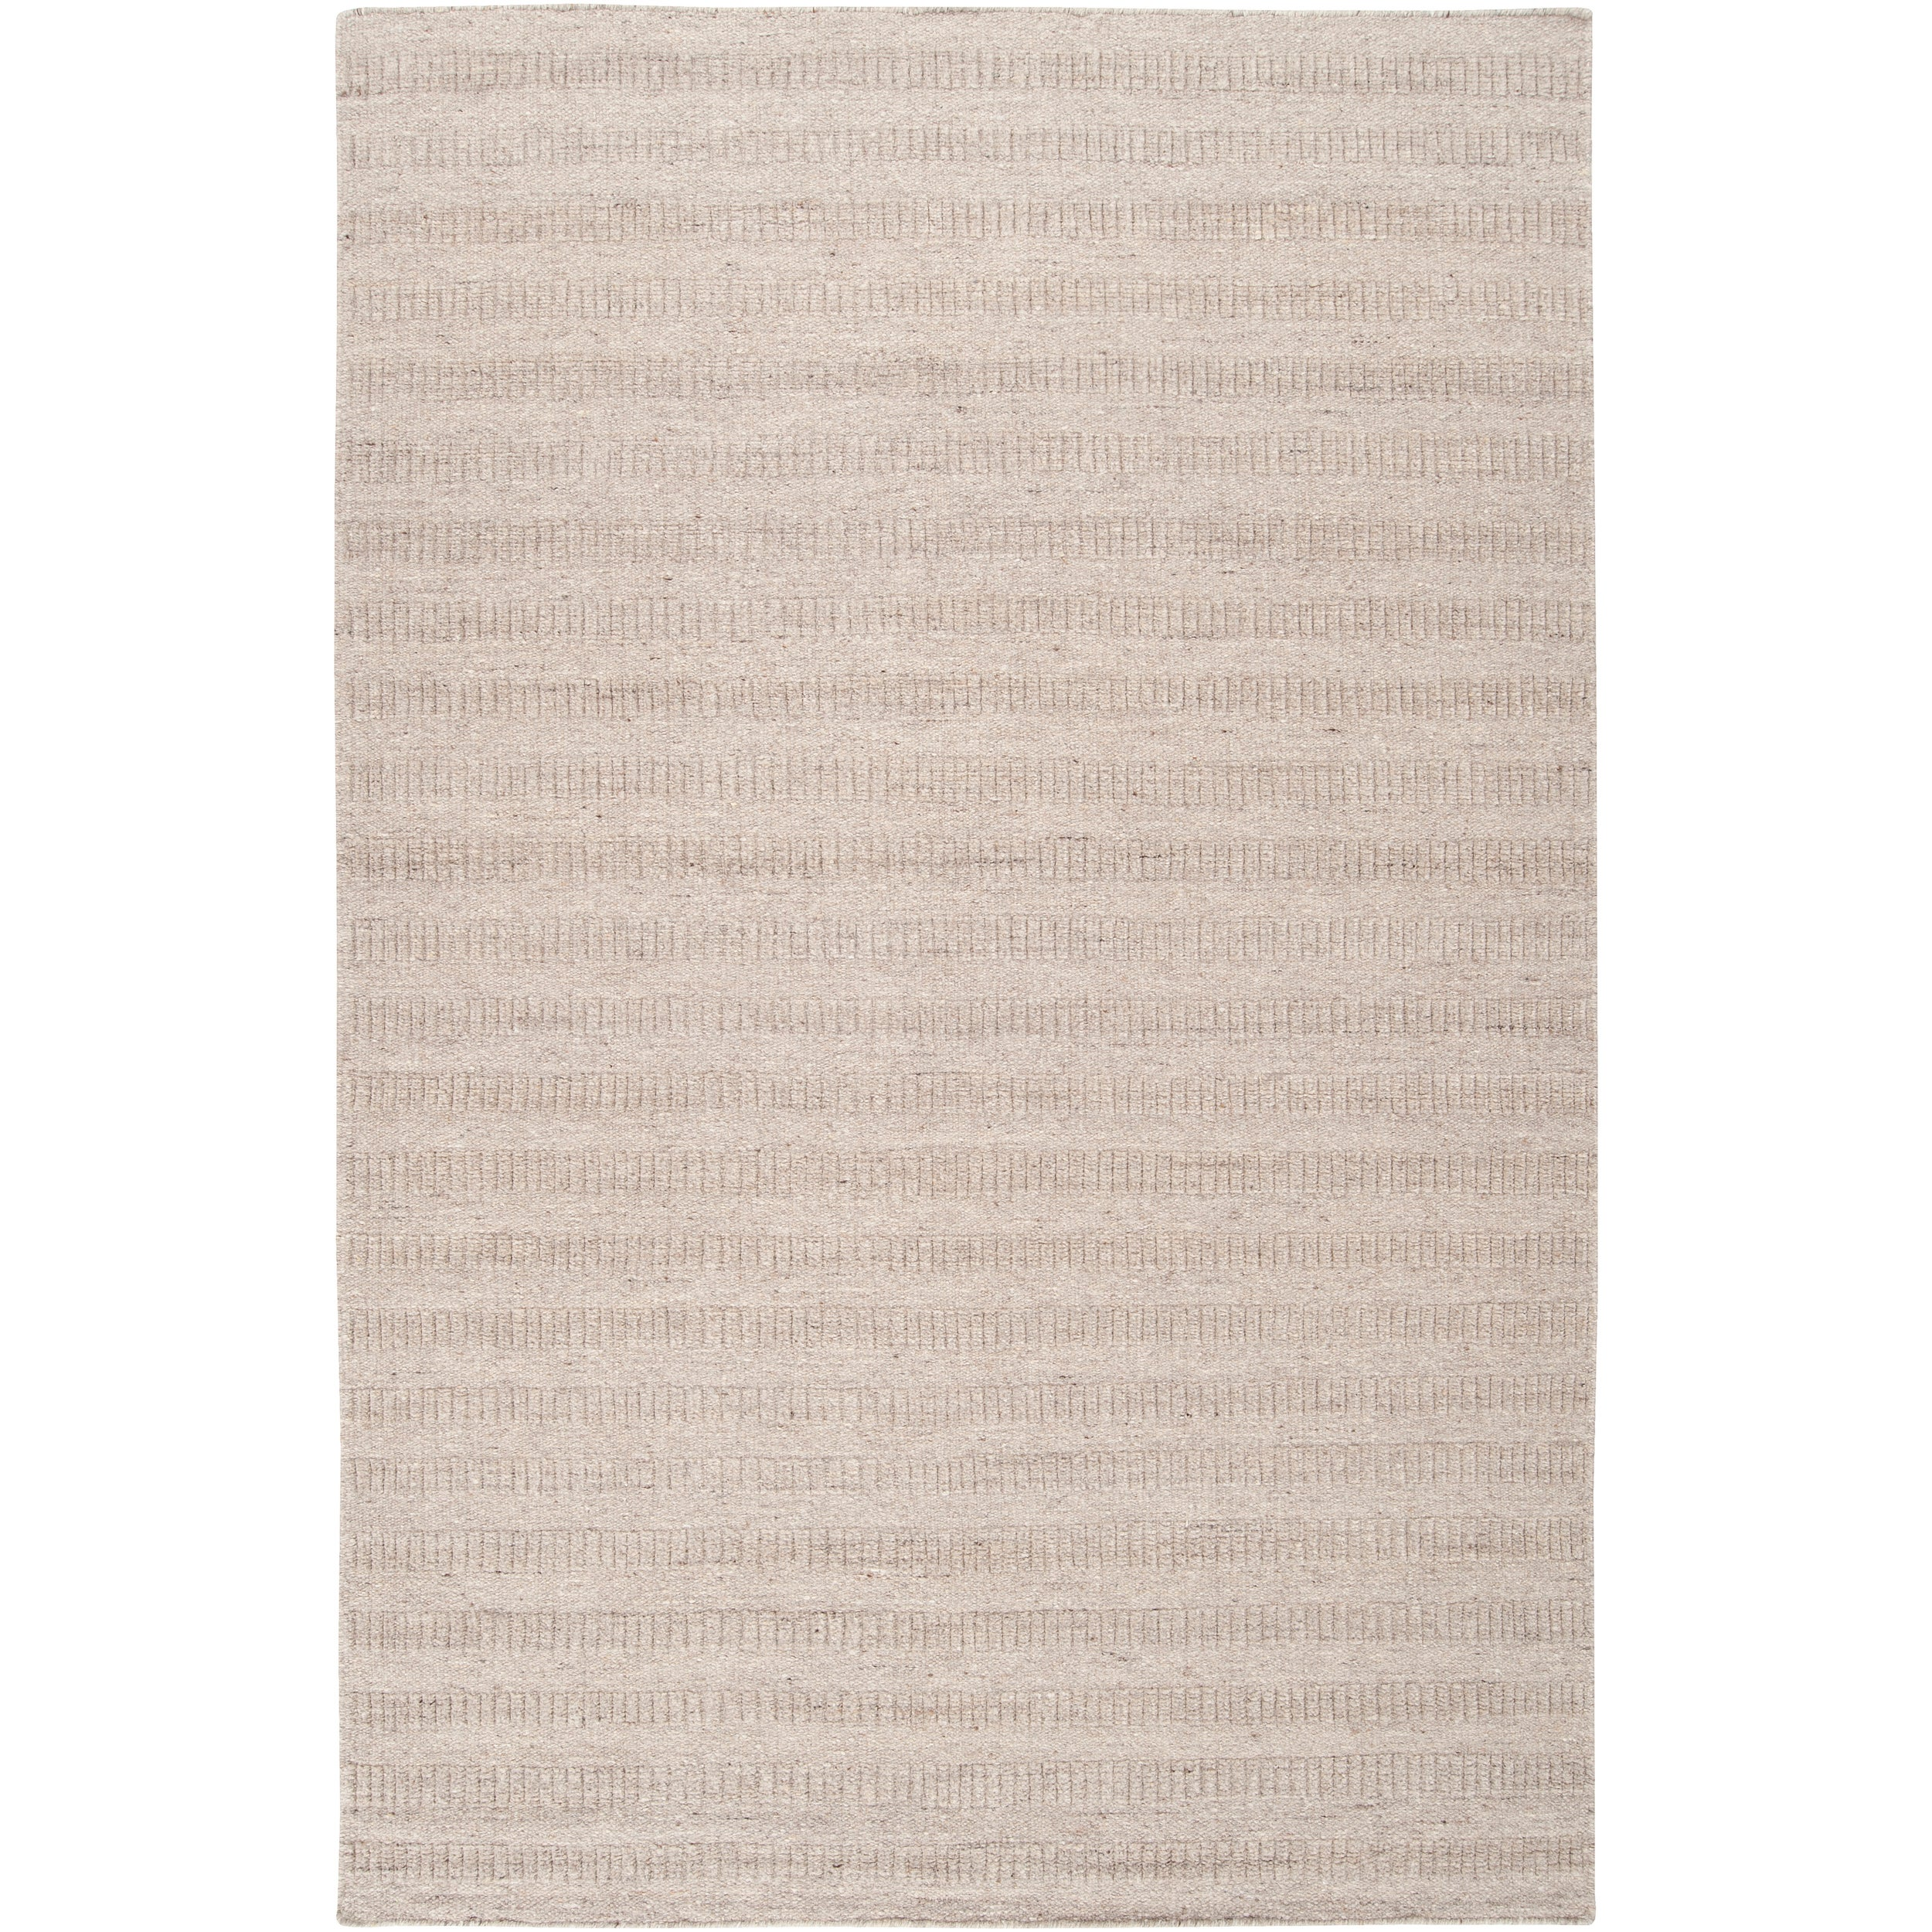 Hand-crafted Solid Grey Baham  Wool Rug (8' x 10')